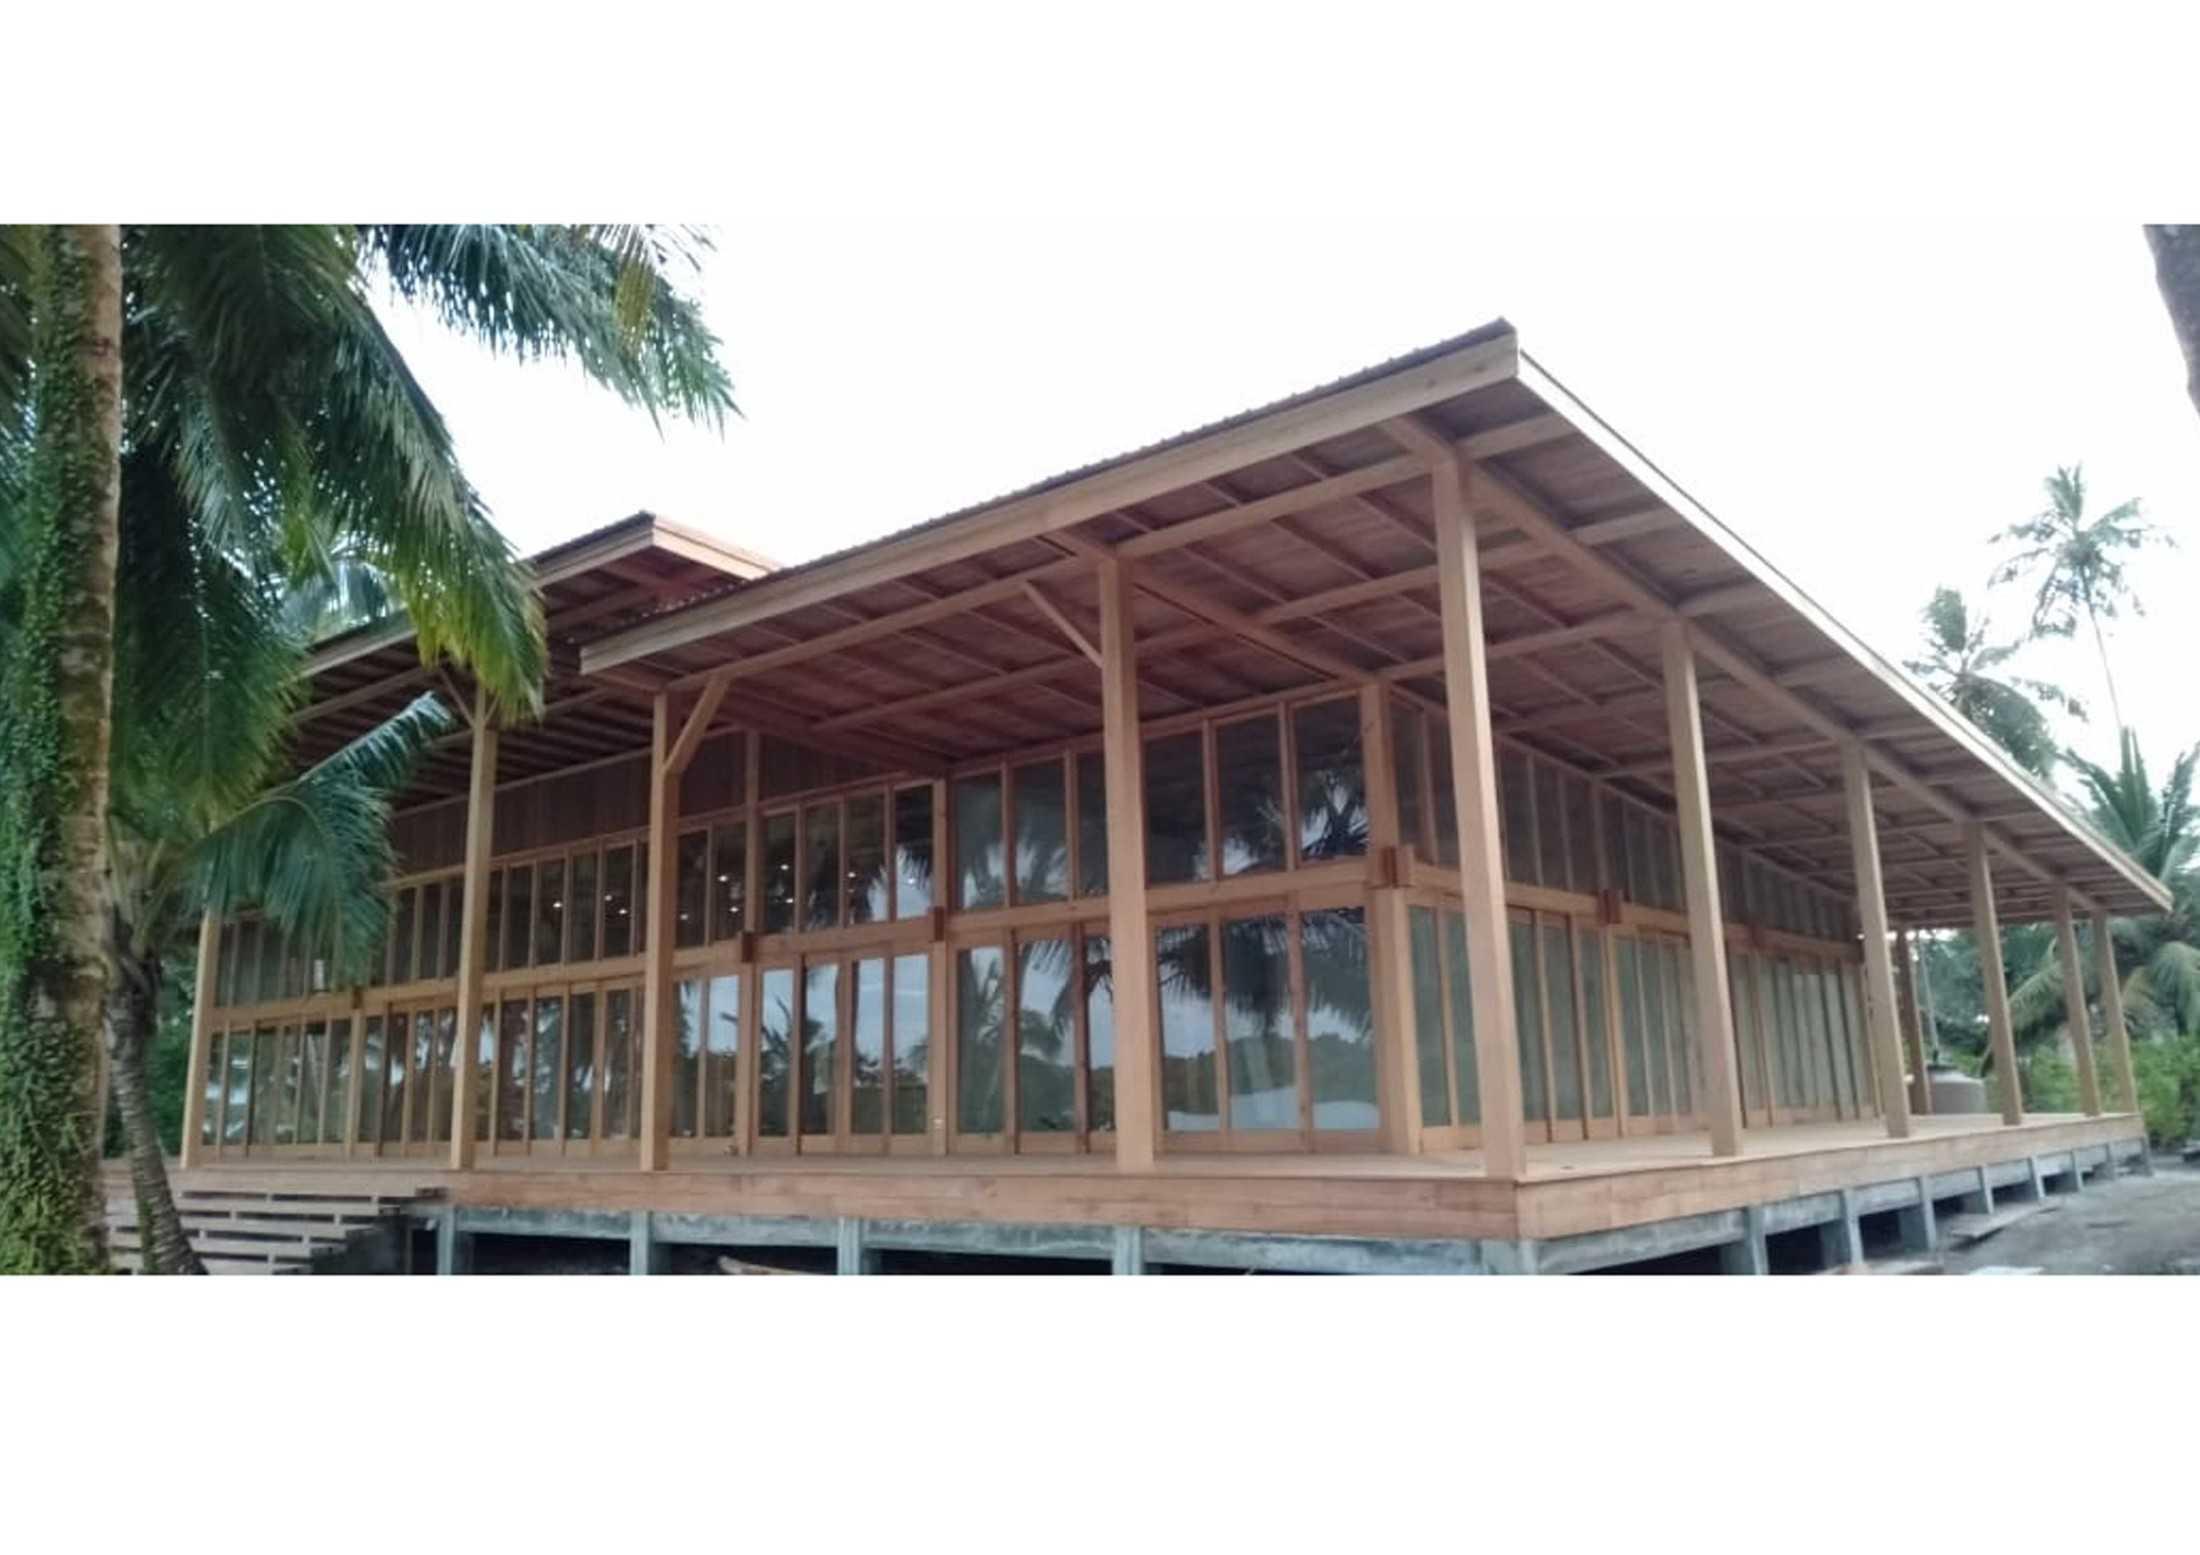 Revan Teggar Mentawai Beach House Kabupaten Kepulauan Mentawai, Sumatera Barat, Indonesia Kabupaten Kepulauan Mentawai, Sumatera Barat, Indonesia Revan-Teggar-Mentawai-Beach-House  107034